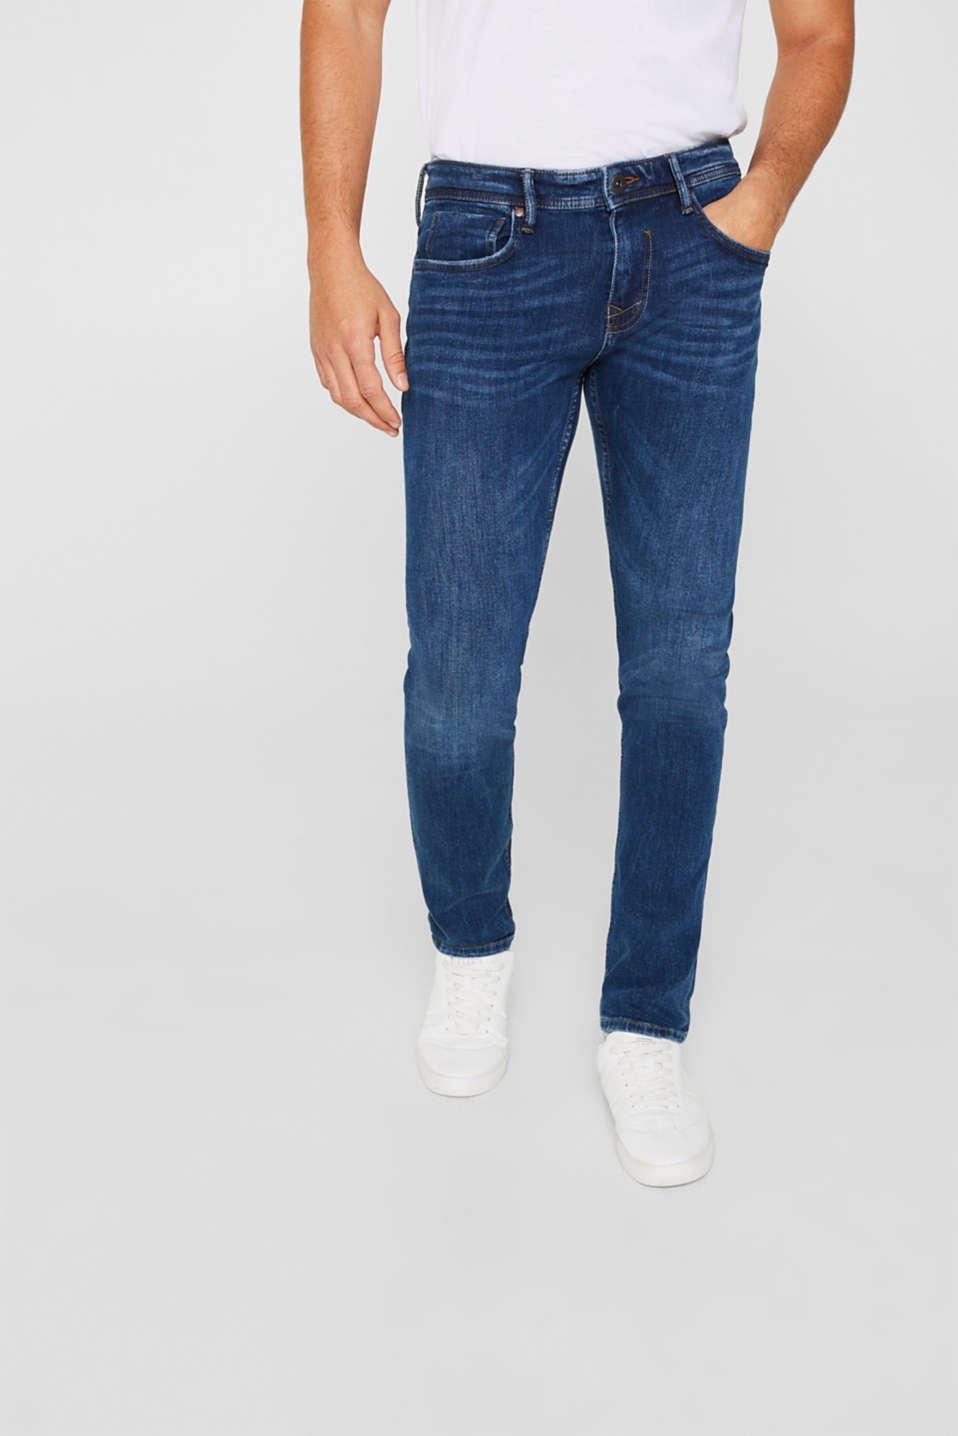 Pants denim Slim fit, BLUE MEDIUM WASH, detail image number 0